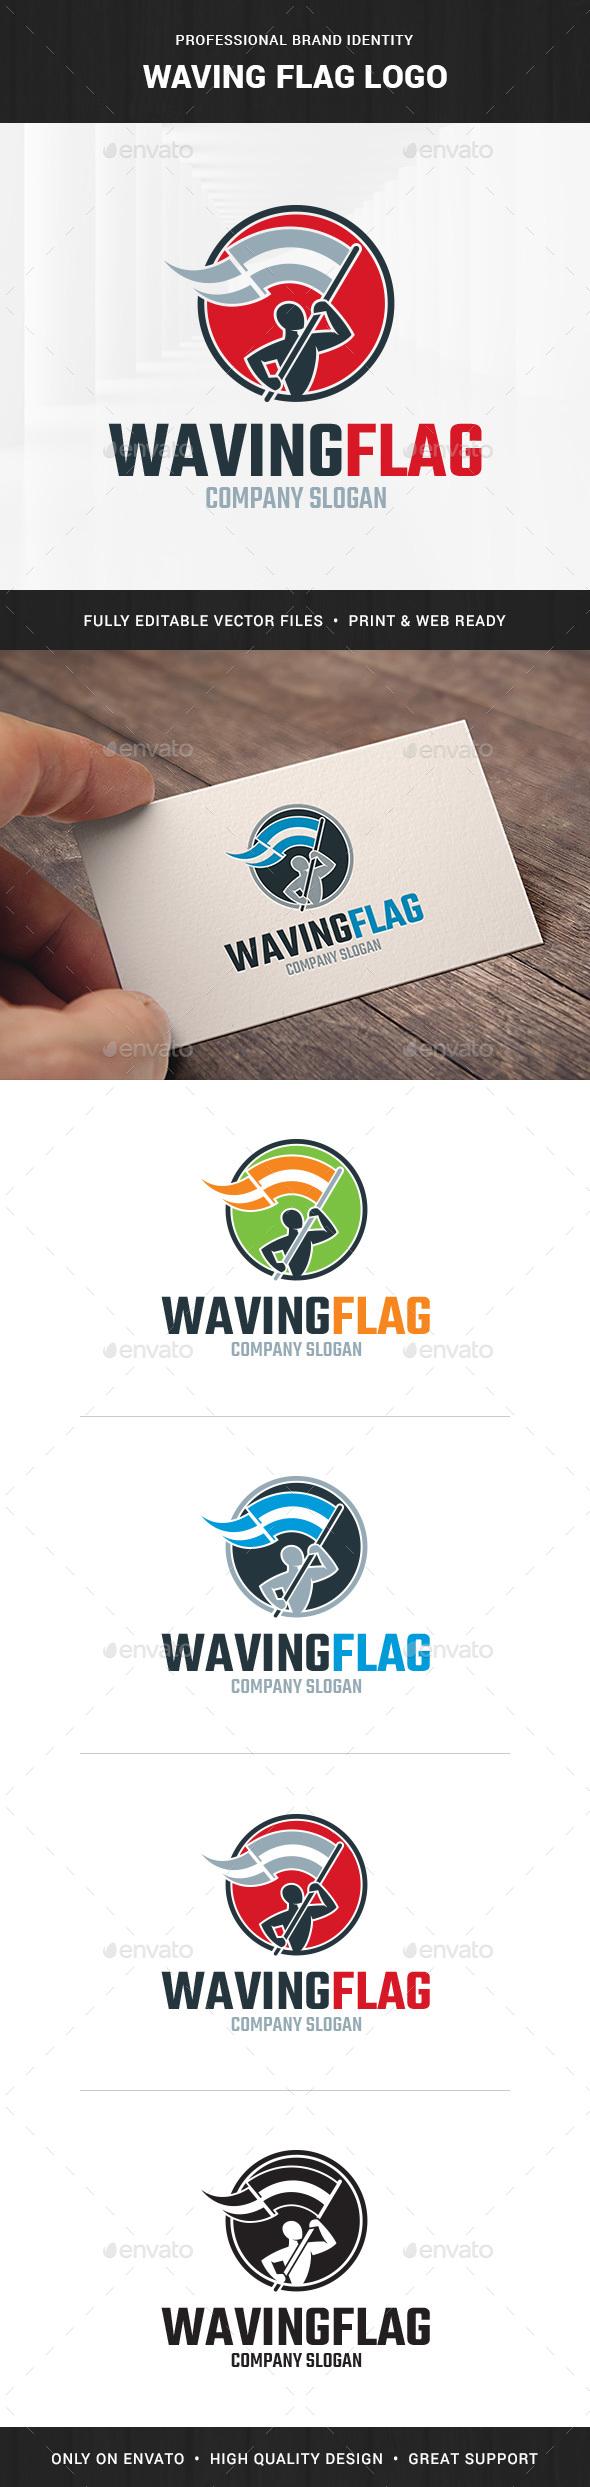 Waving Flag Logo Template